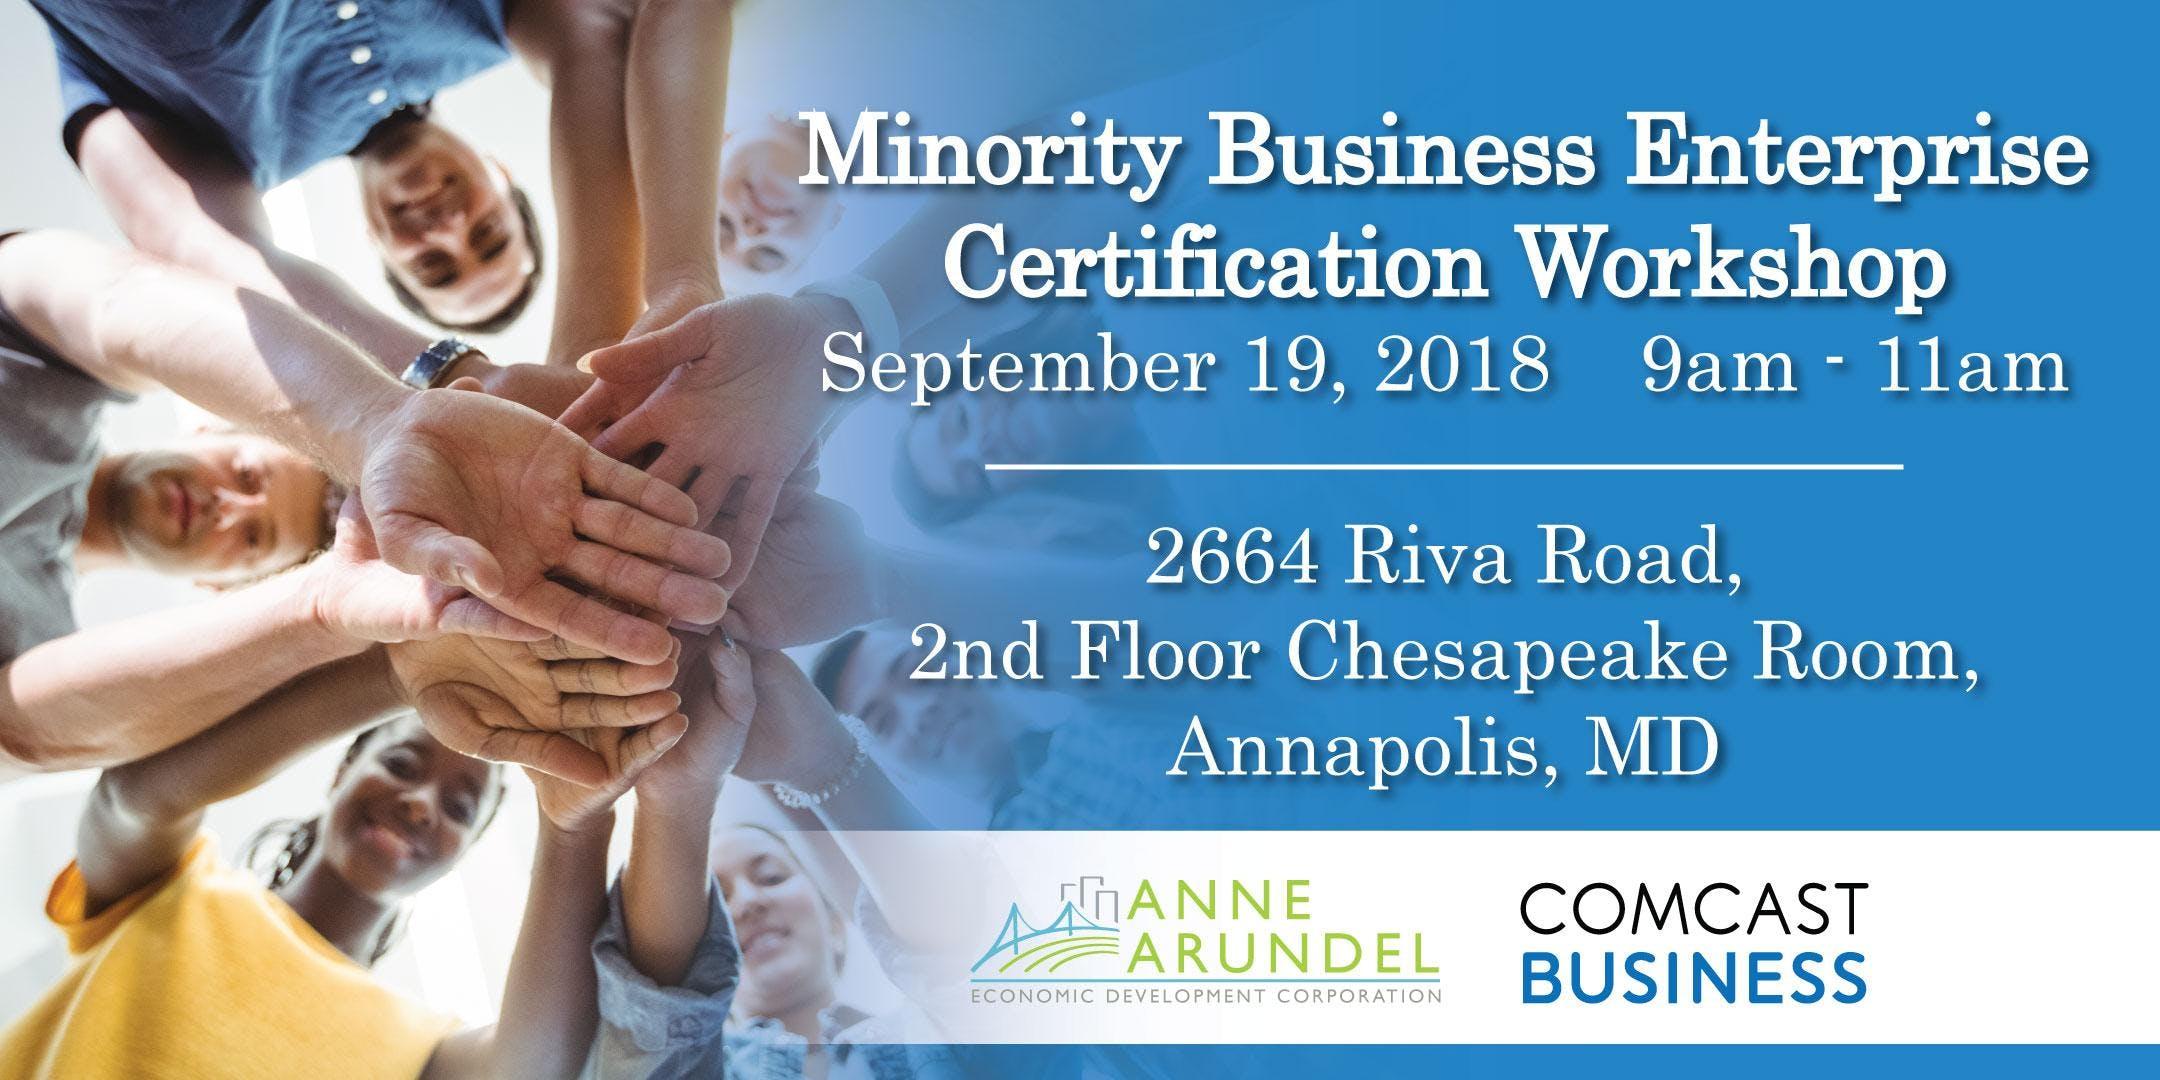 Minority Business Enterprise Certification Workshop 19 Sep 2018